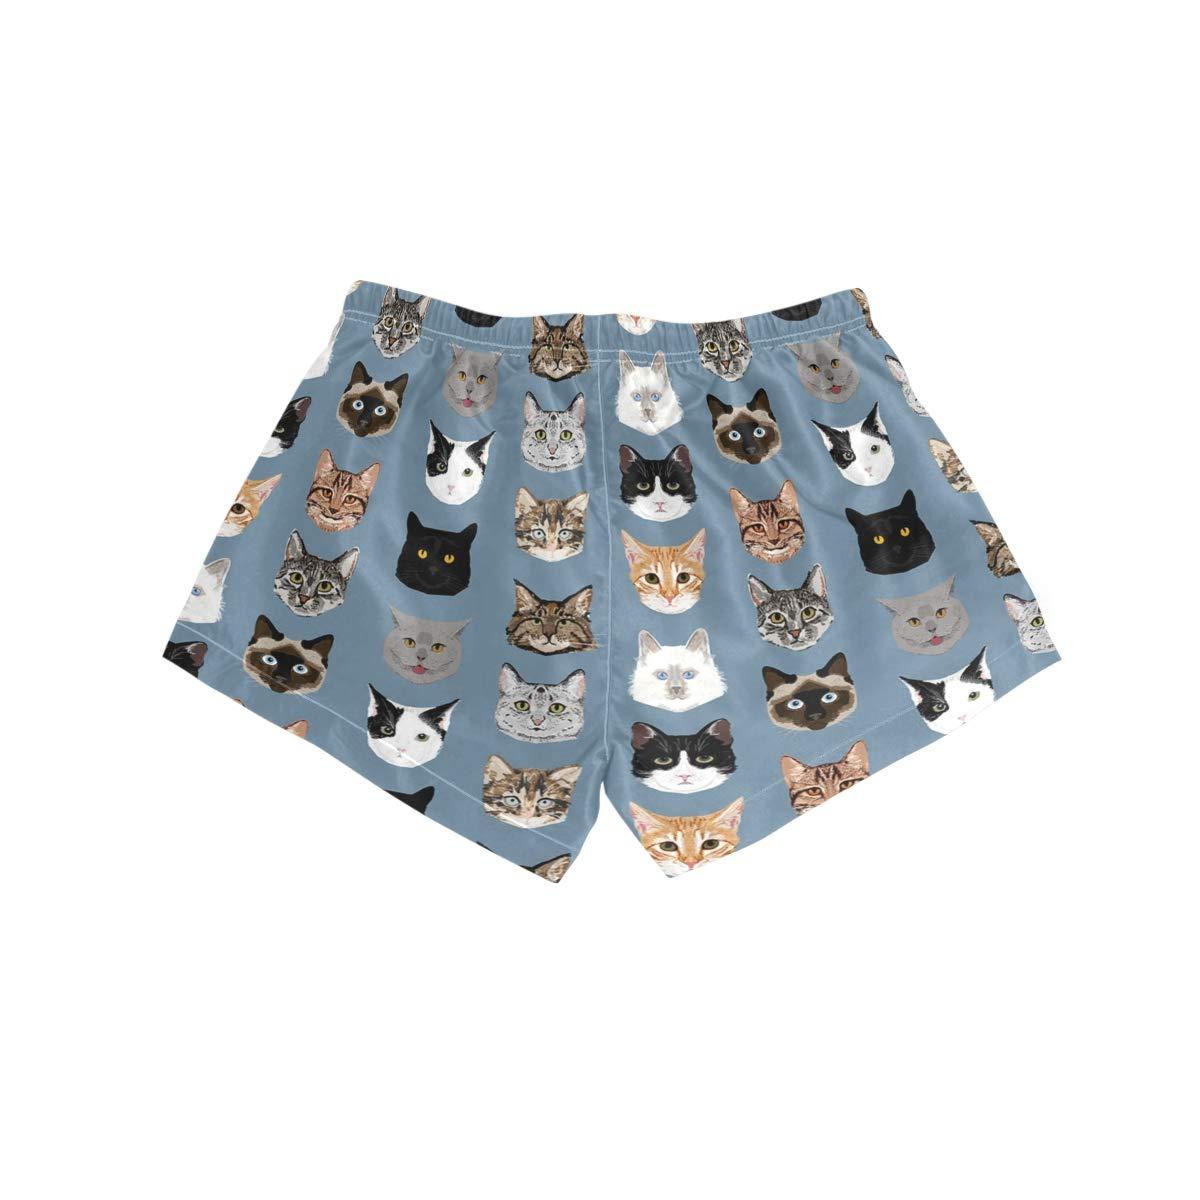 Womens Swim Trunks Quick Dry Beach Shorts with Mesh Lining Blue Grey Cat Head